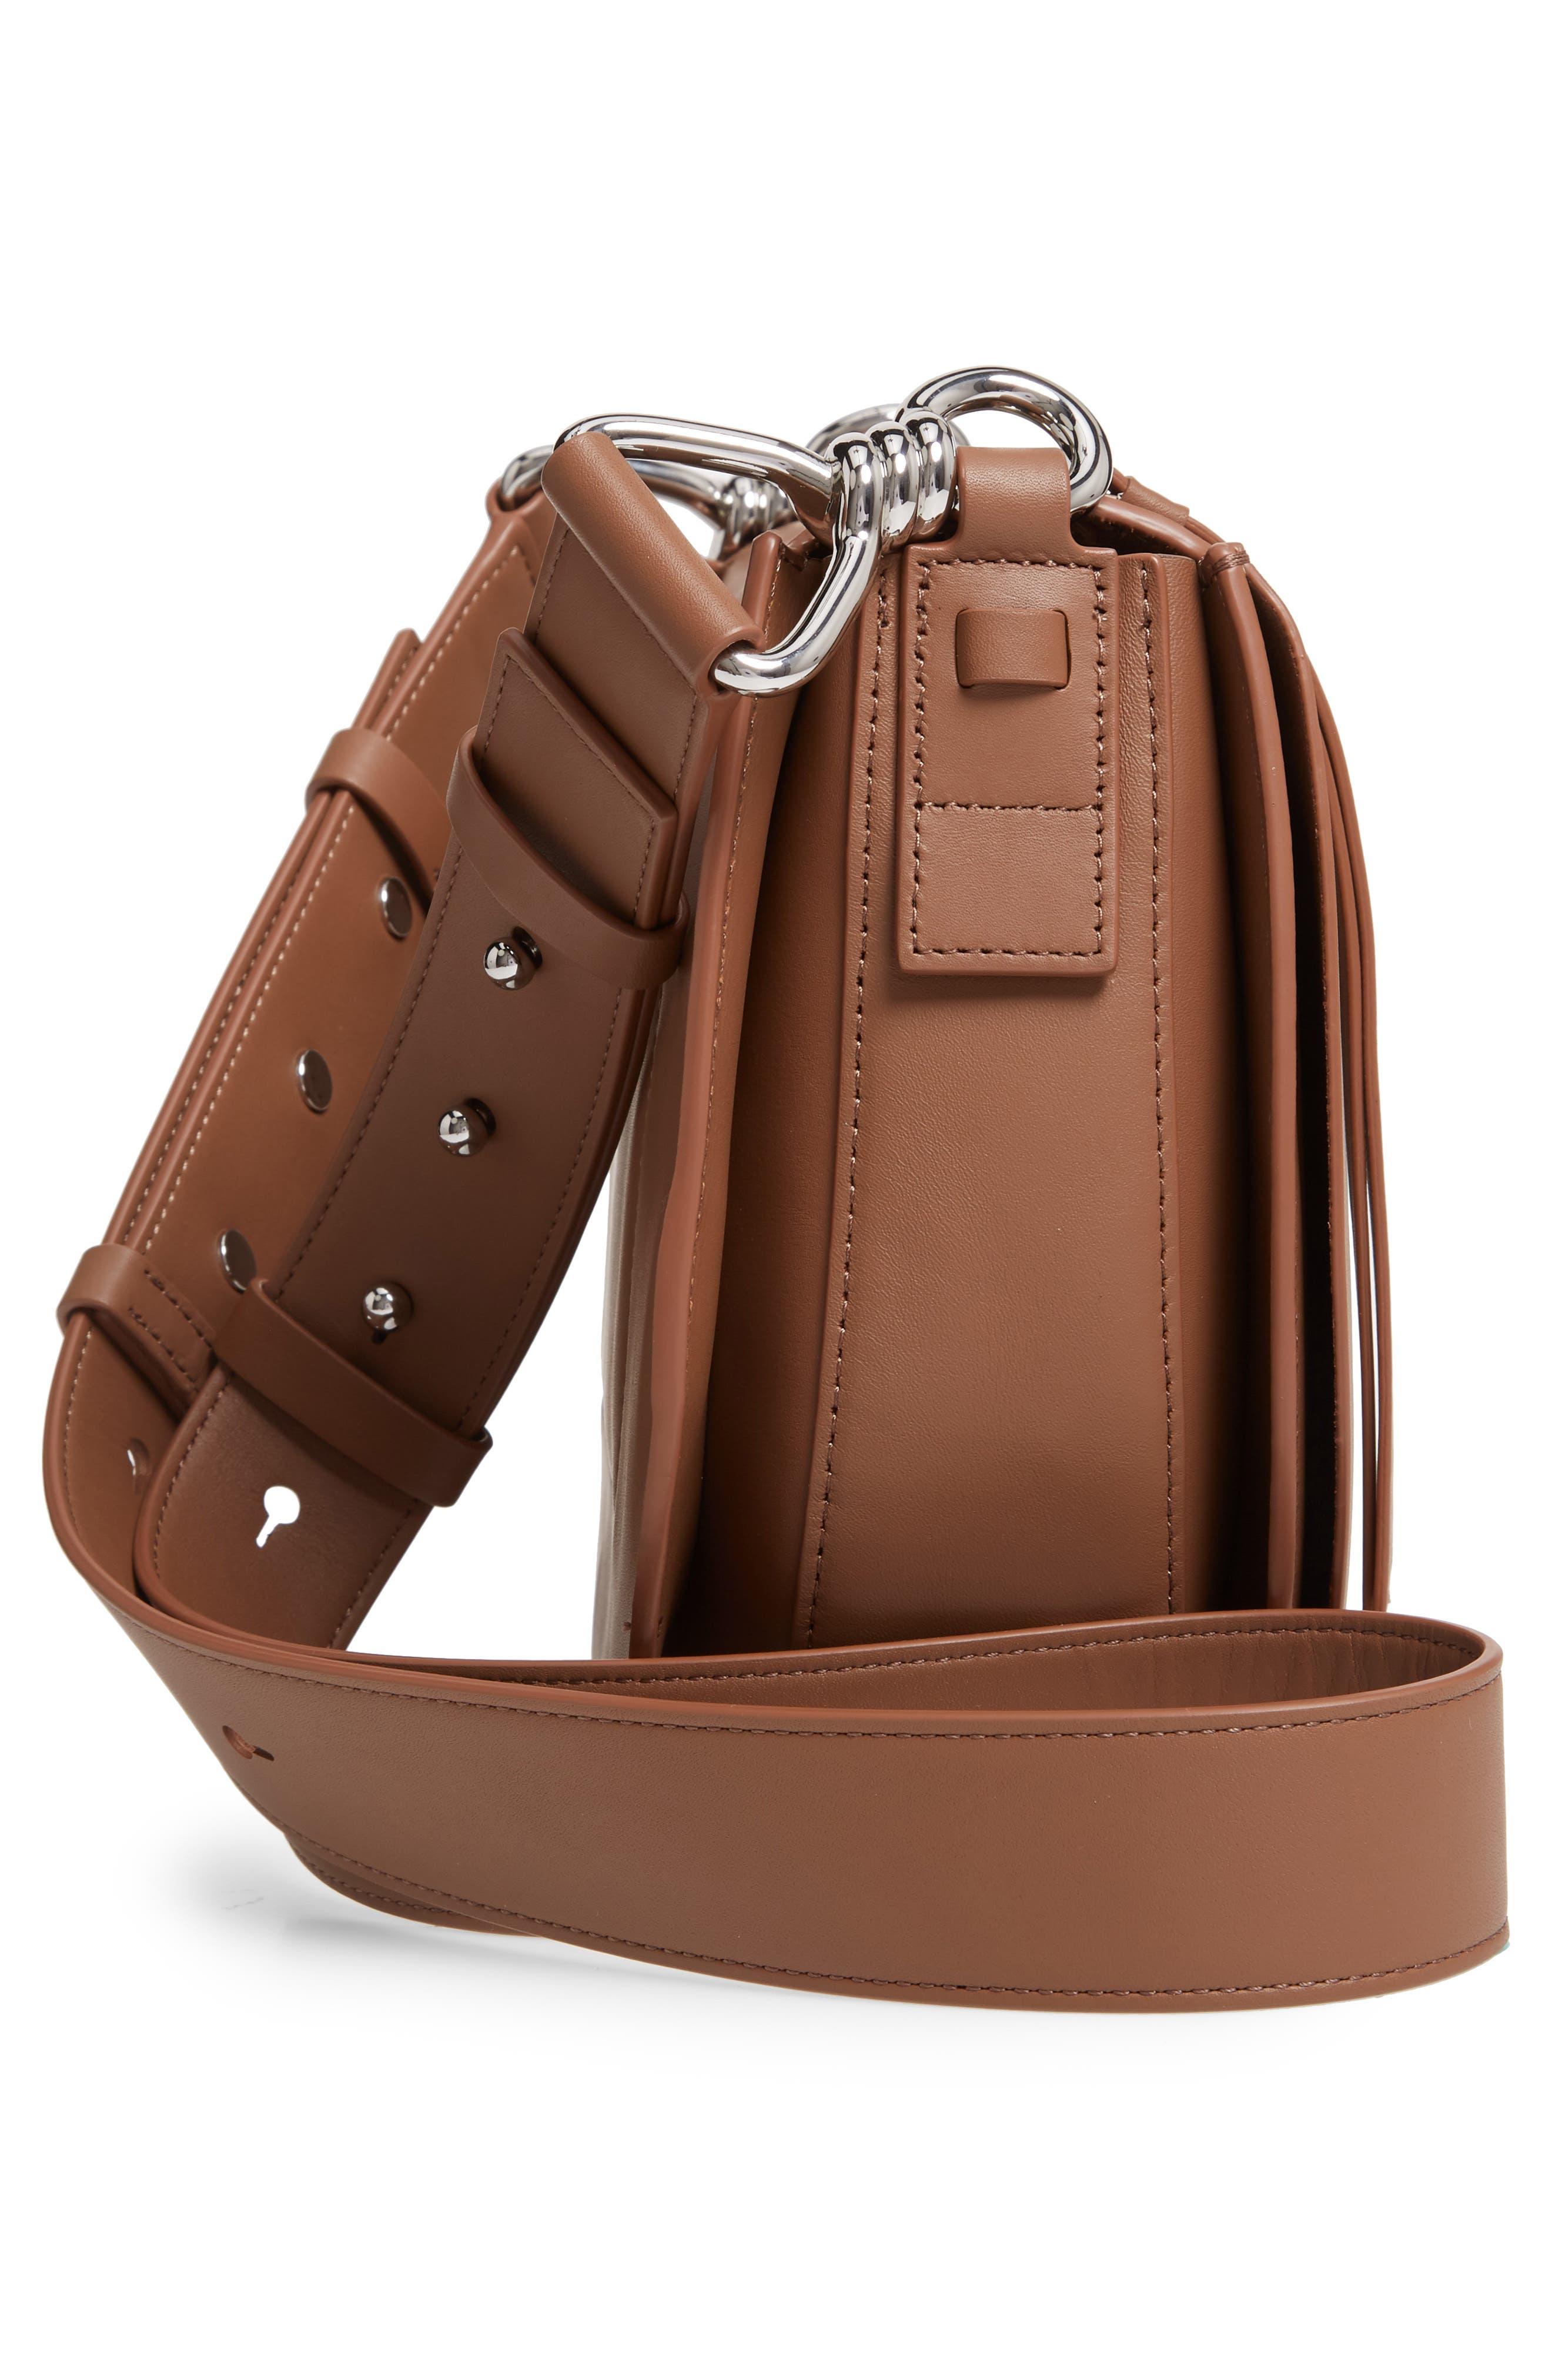 ALLSAINTS, Captain Round Leather Crossbody Bag, Alternate thumbnail 5, color, MILK CHOCOLATE